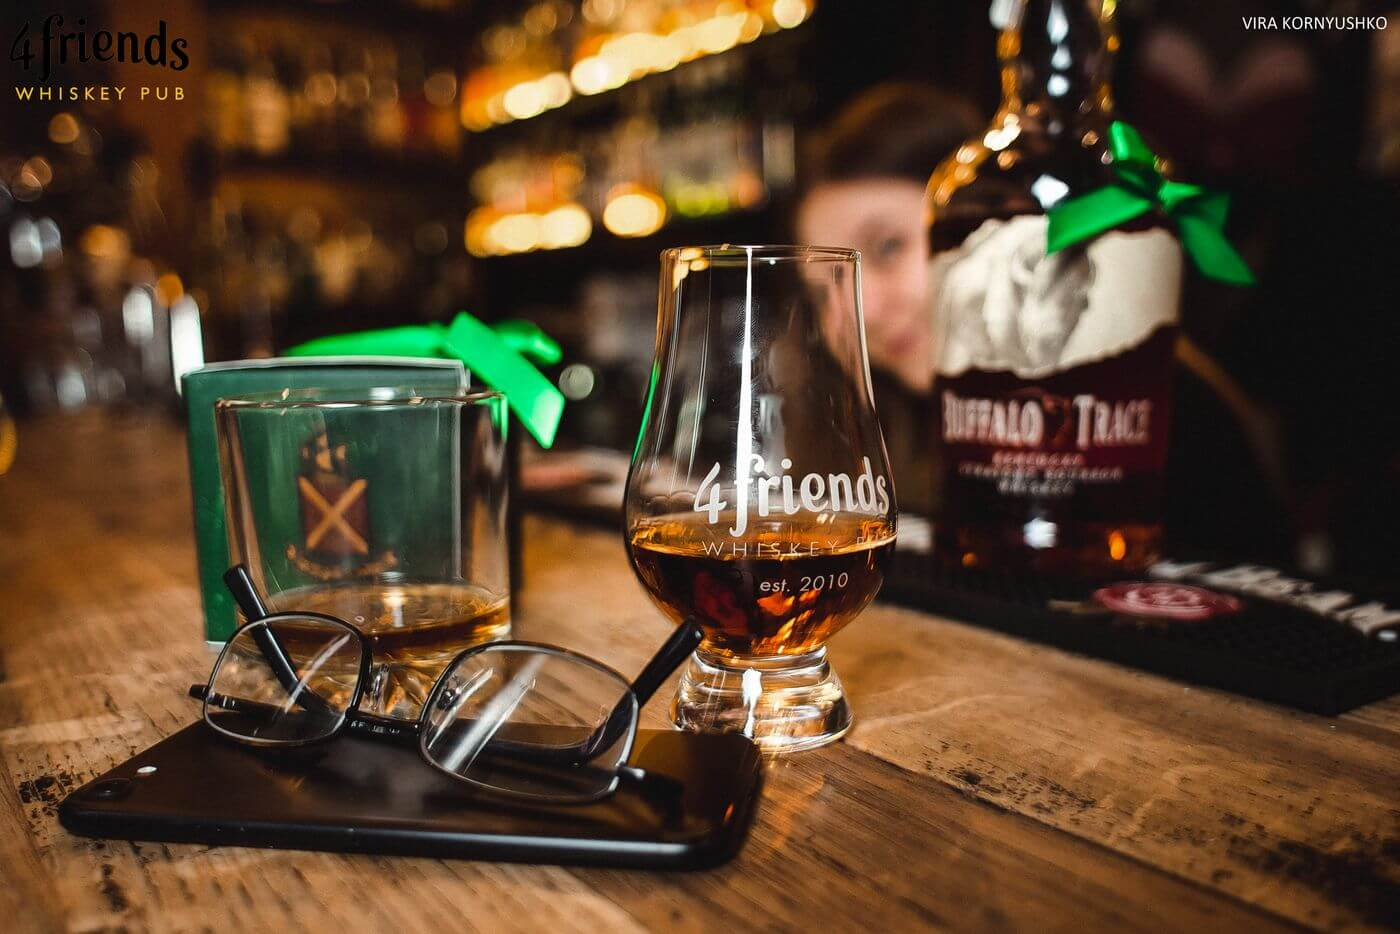 4friends Whiskey Pub | LvivOnline (Львів Онлайн)